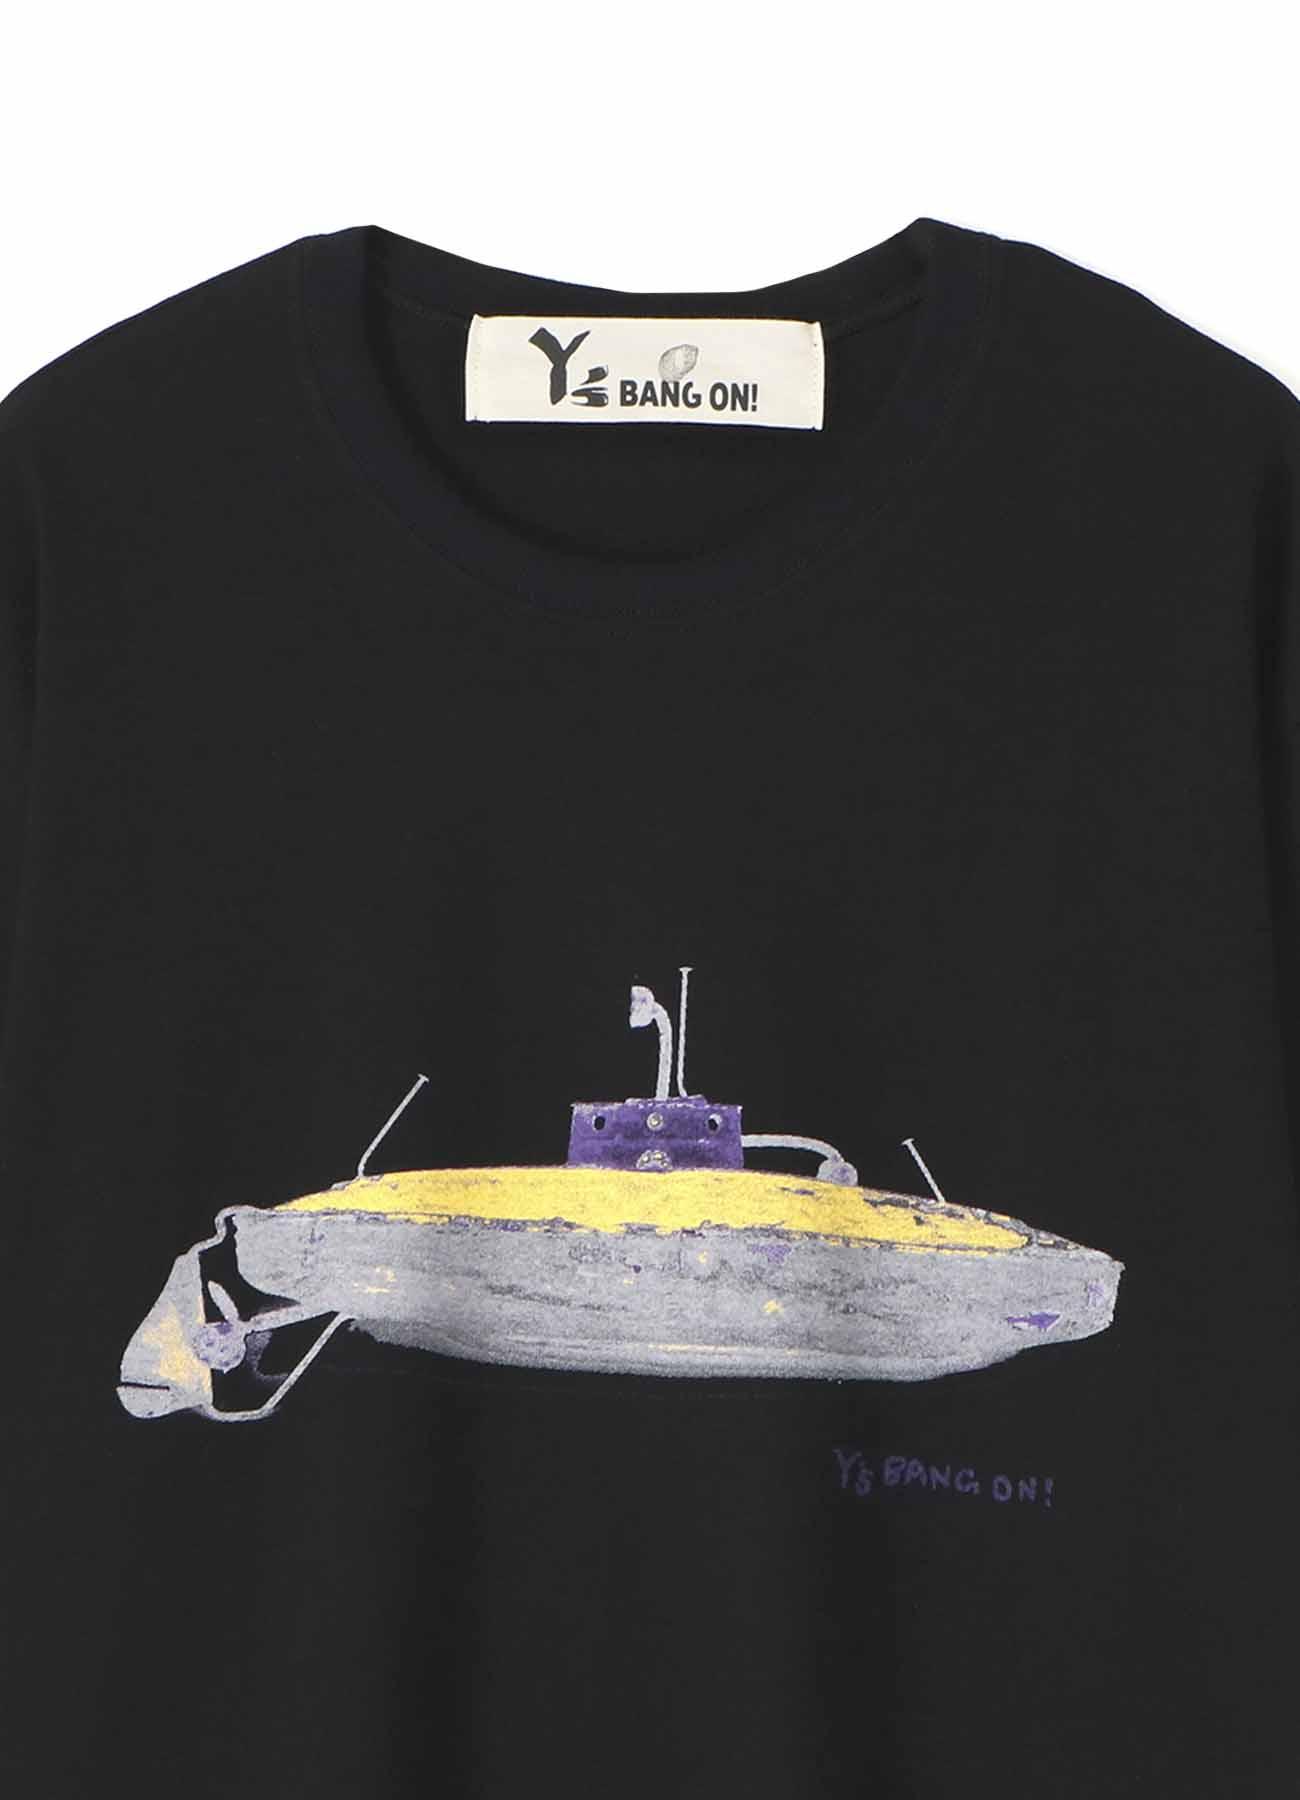 Y's BANJG ON!SABMARINE T-Shirt